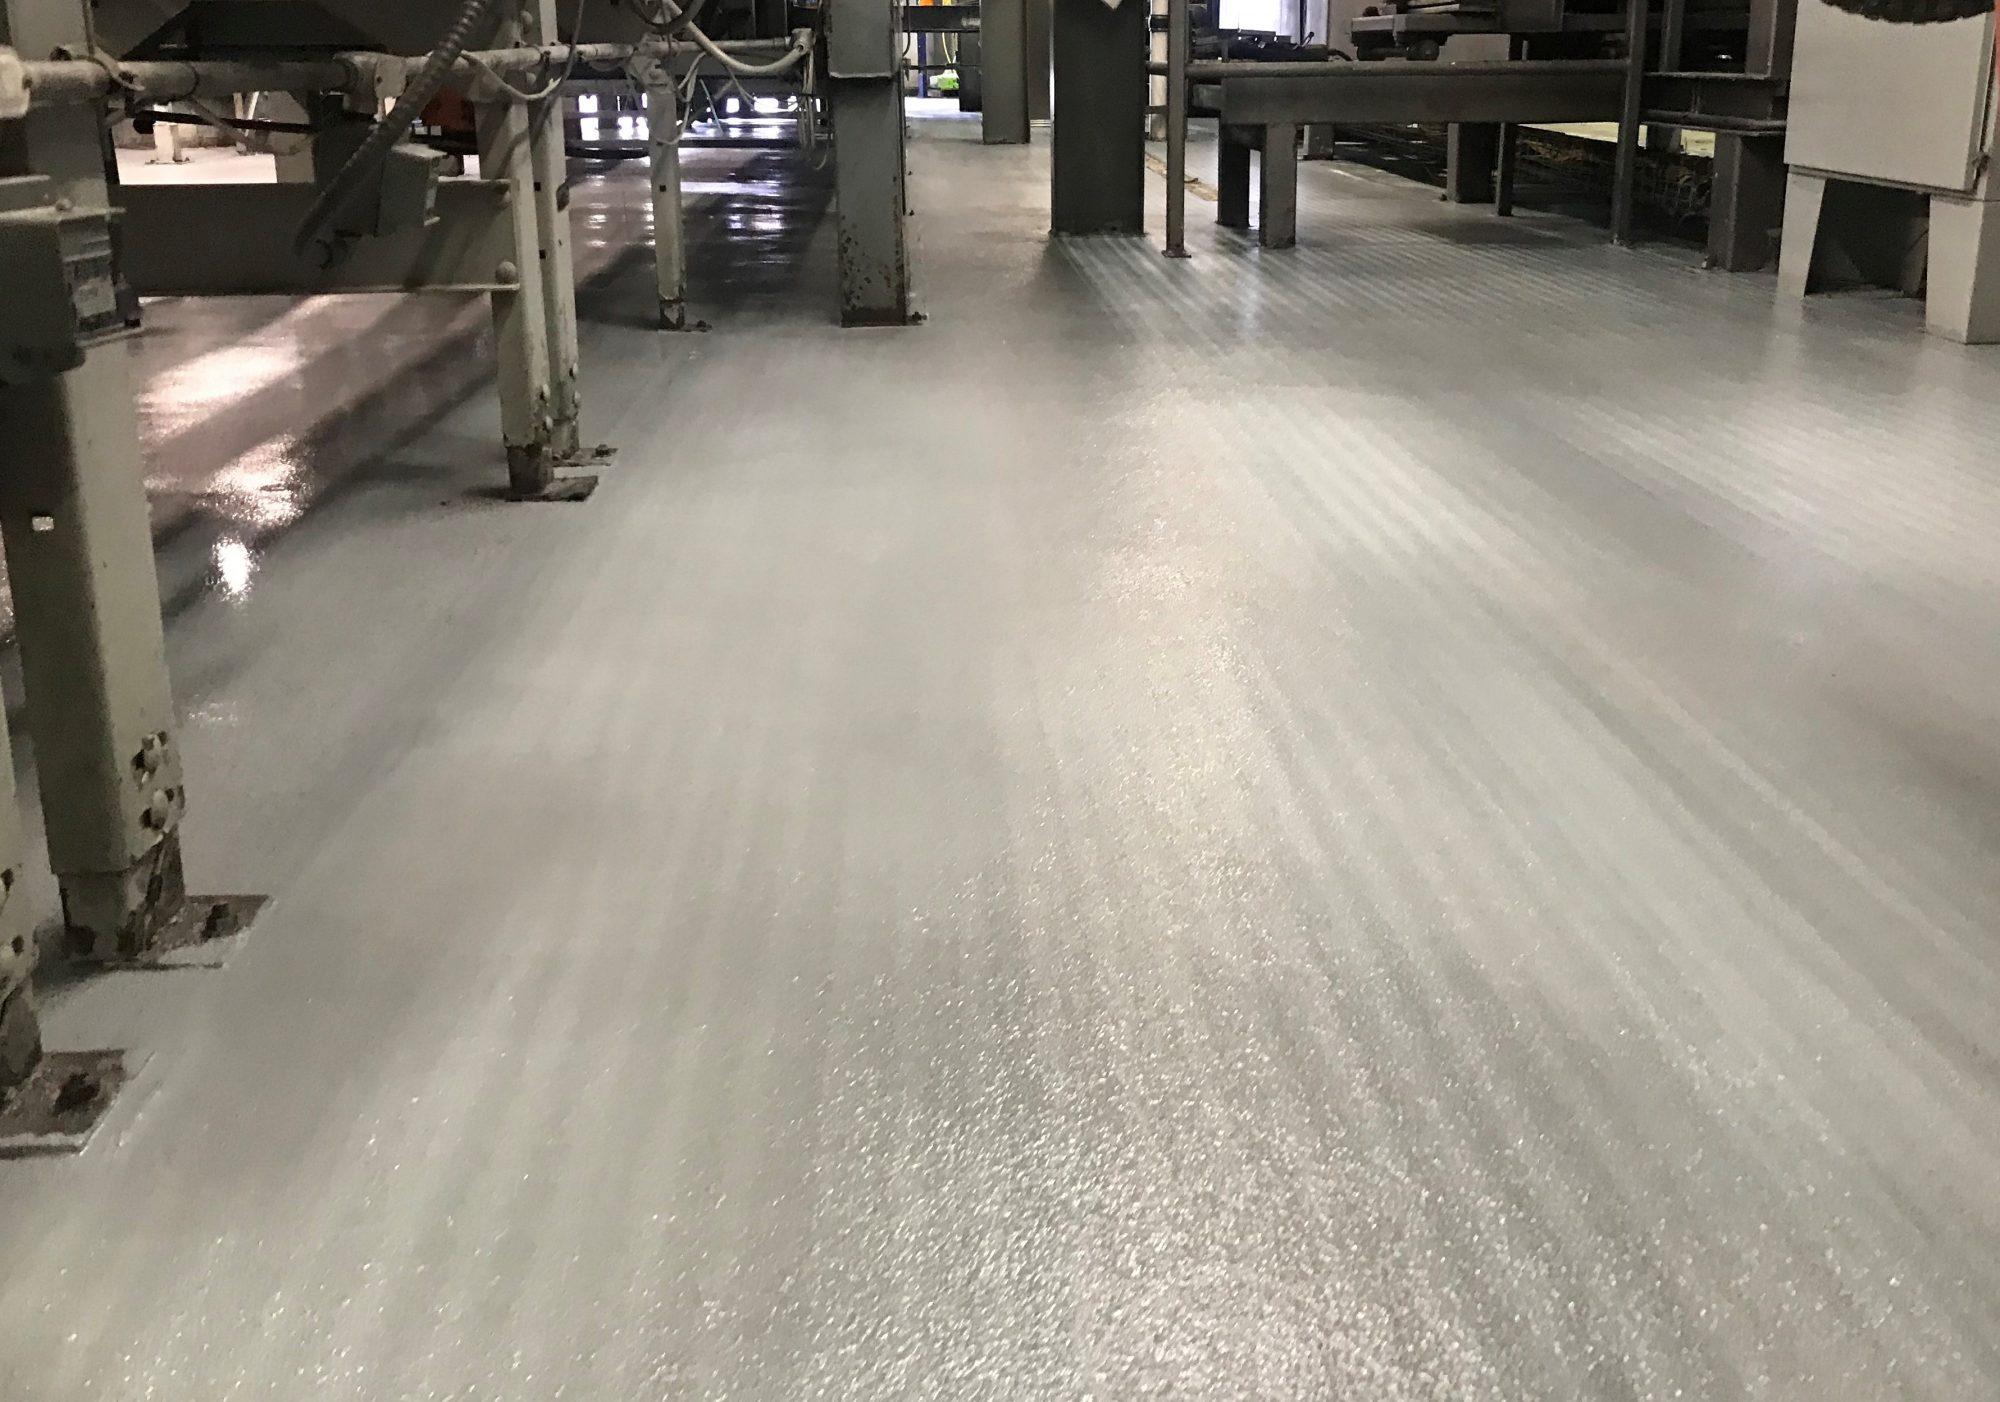 urethane mortar, epoxy mortar, Industrial Applications Inc, IA30yrs, industrial concrete flooring, Industrial concrete floors, urethane mortar experts